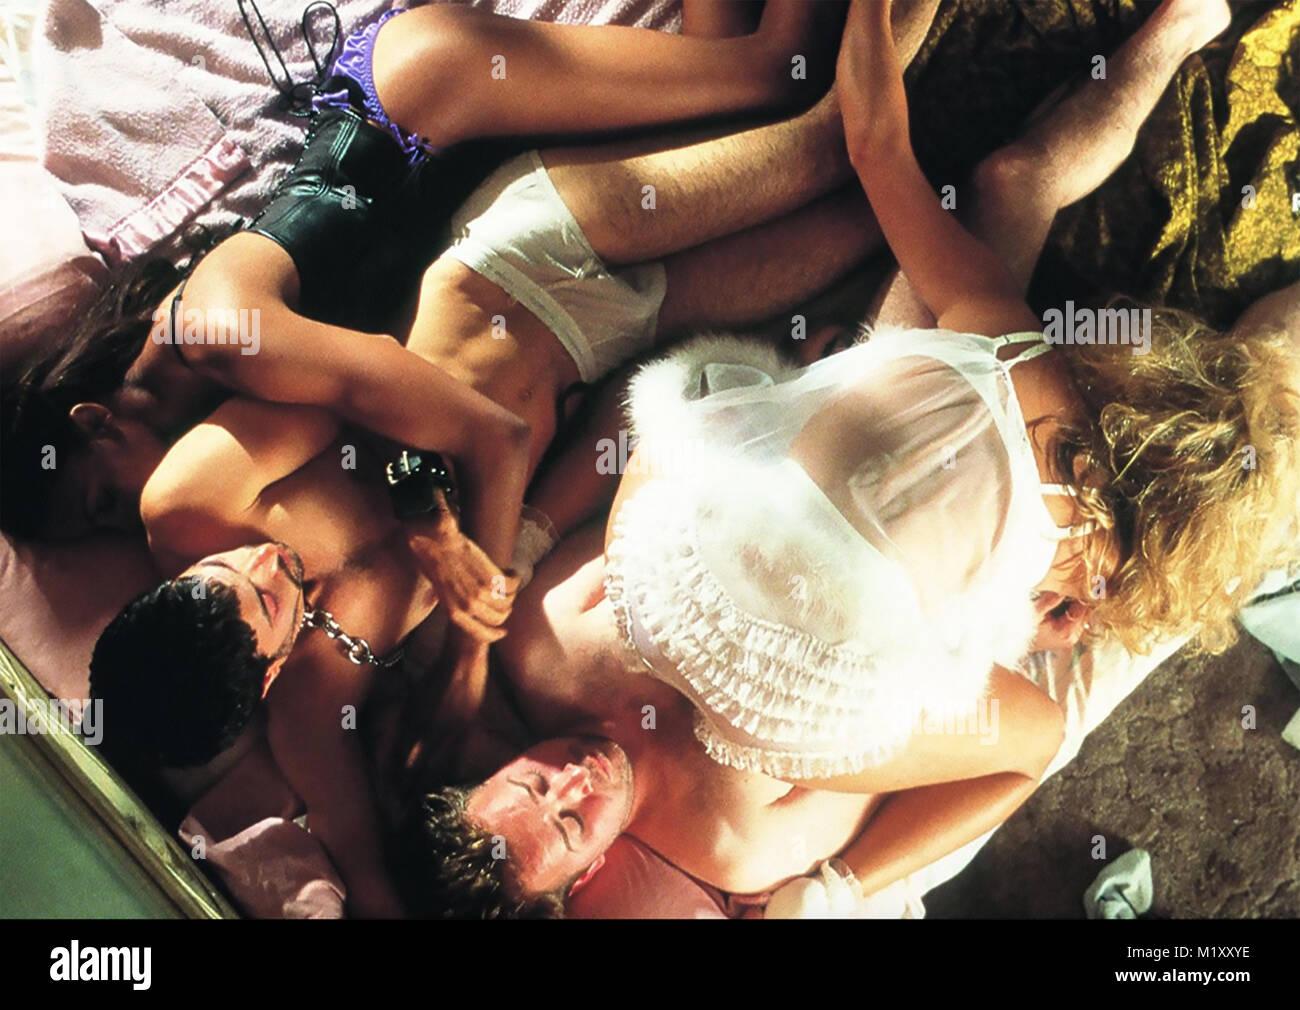 NO VACANCY 1999 2 Loop Films production - Stock Image